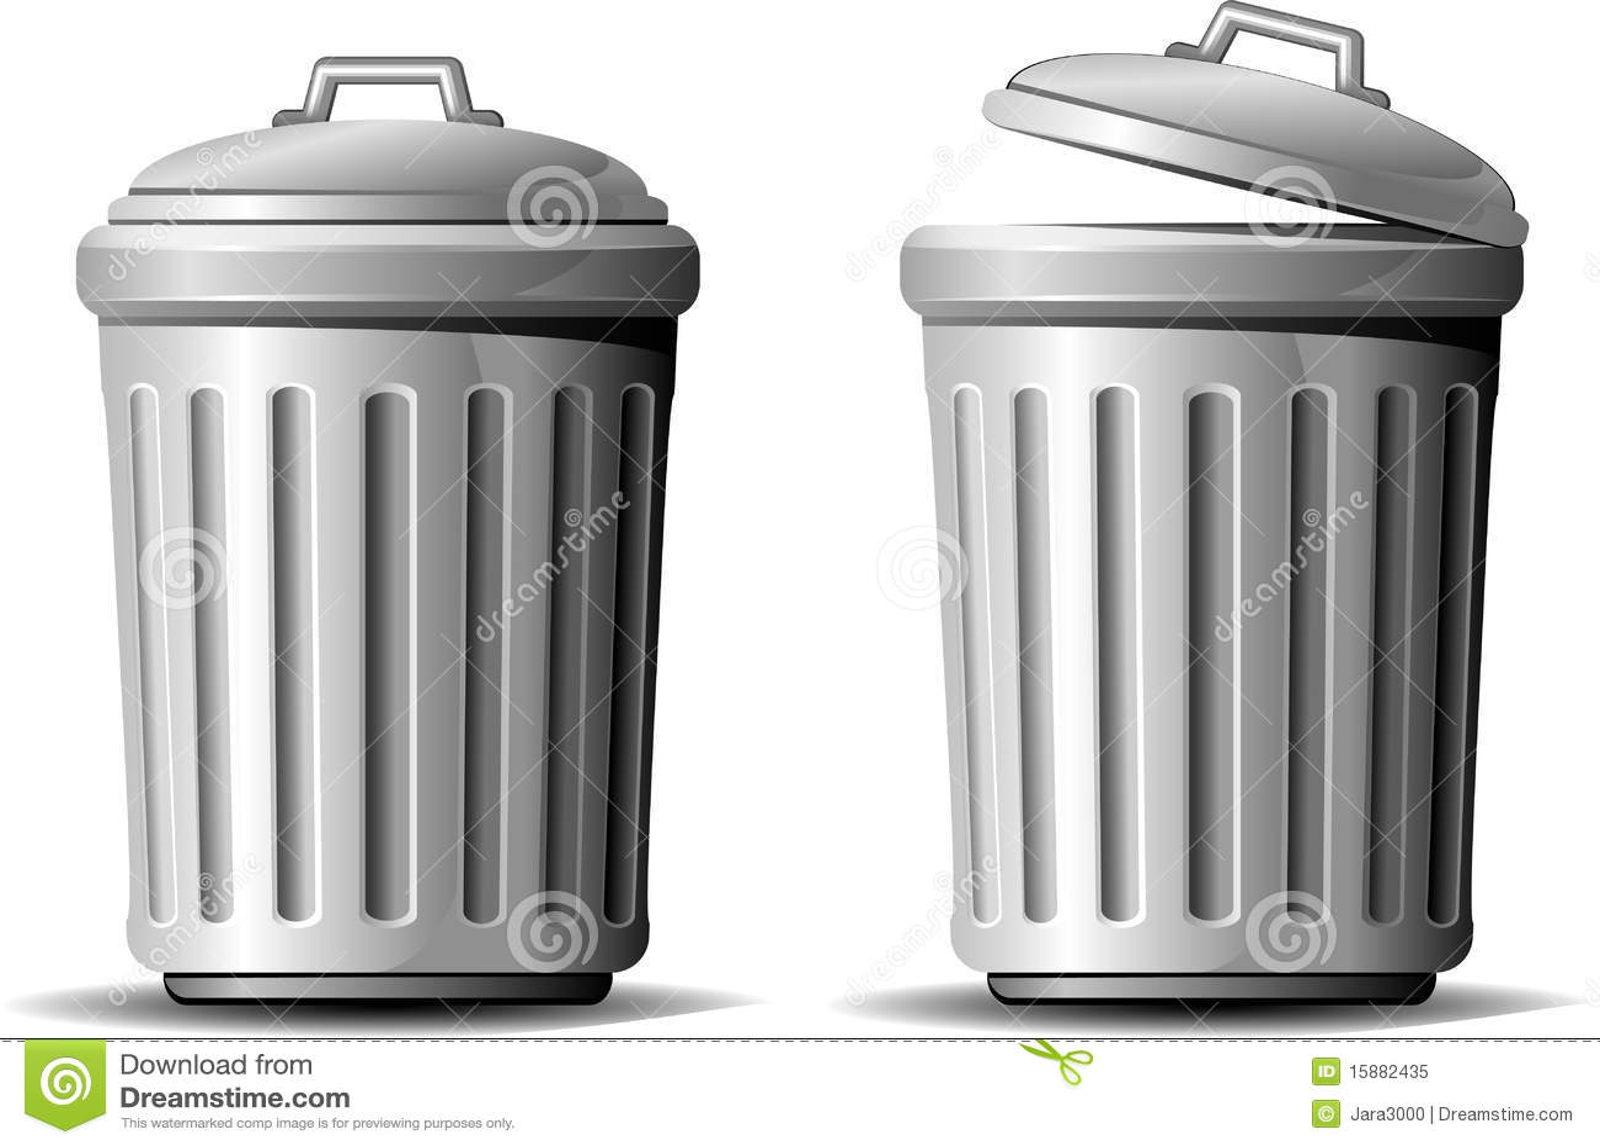 Trash can stock vector. Illustration of bucket 5982b2396511